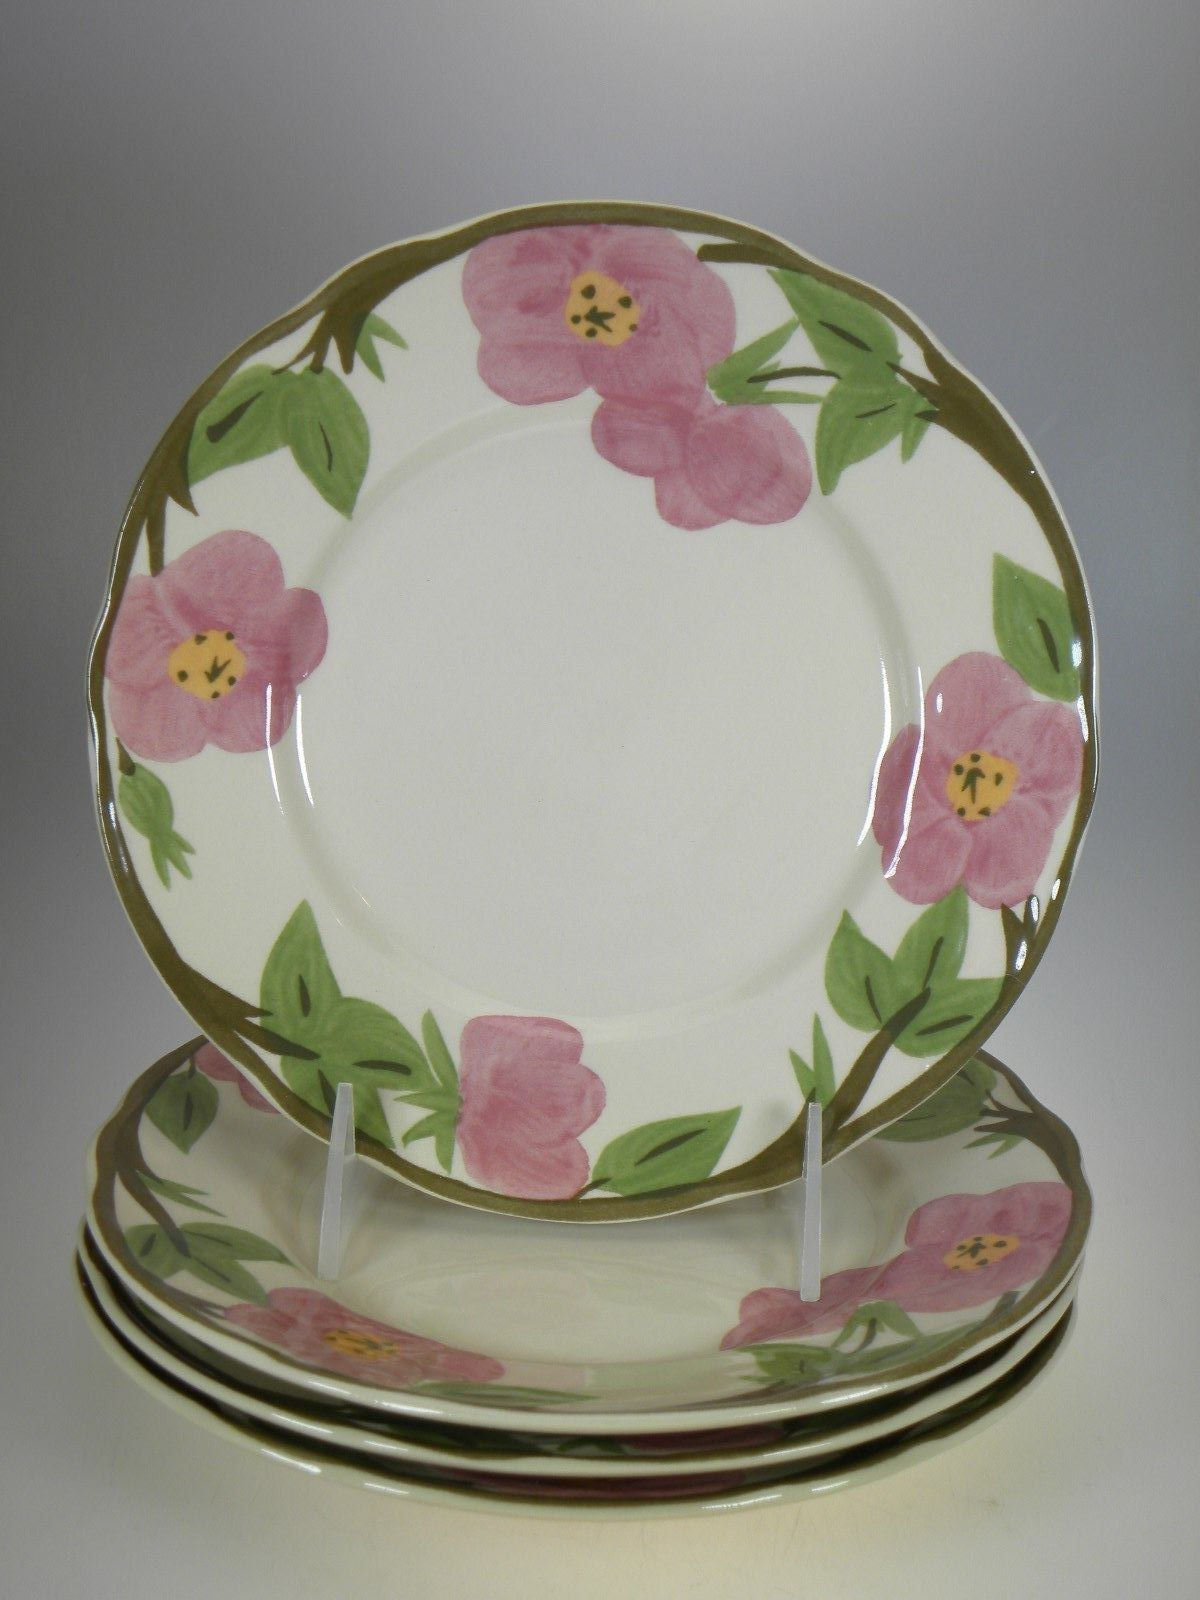 Franciscan Desert Rose Salad Plates Set of 4 BRAND NEW PRODUCTION